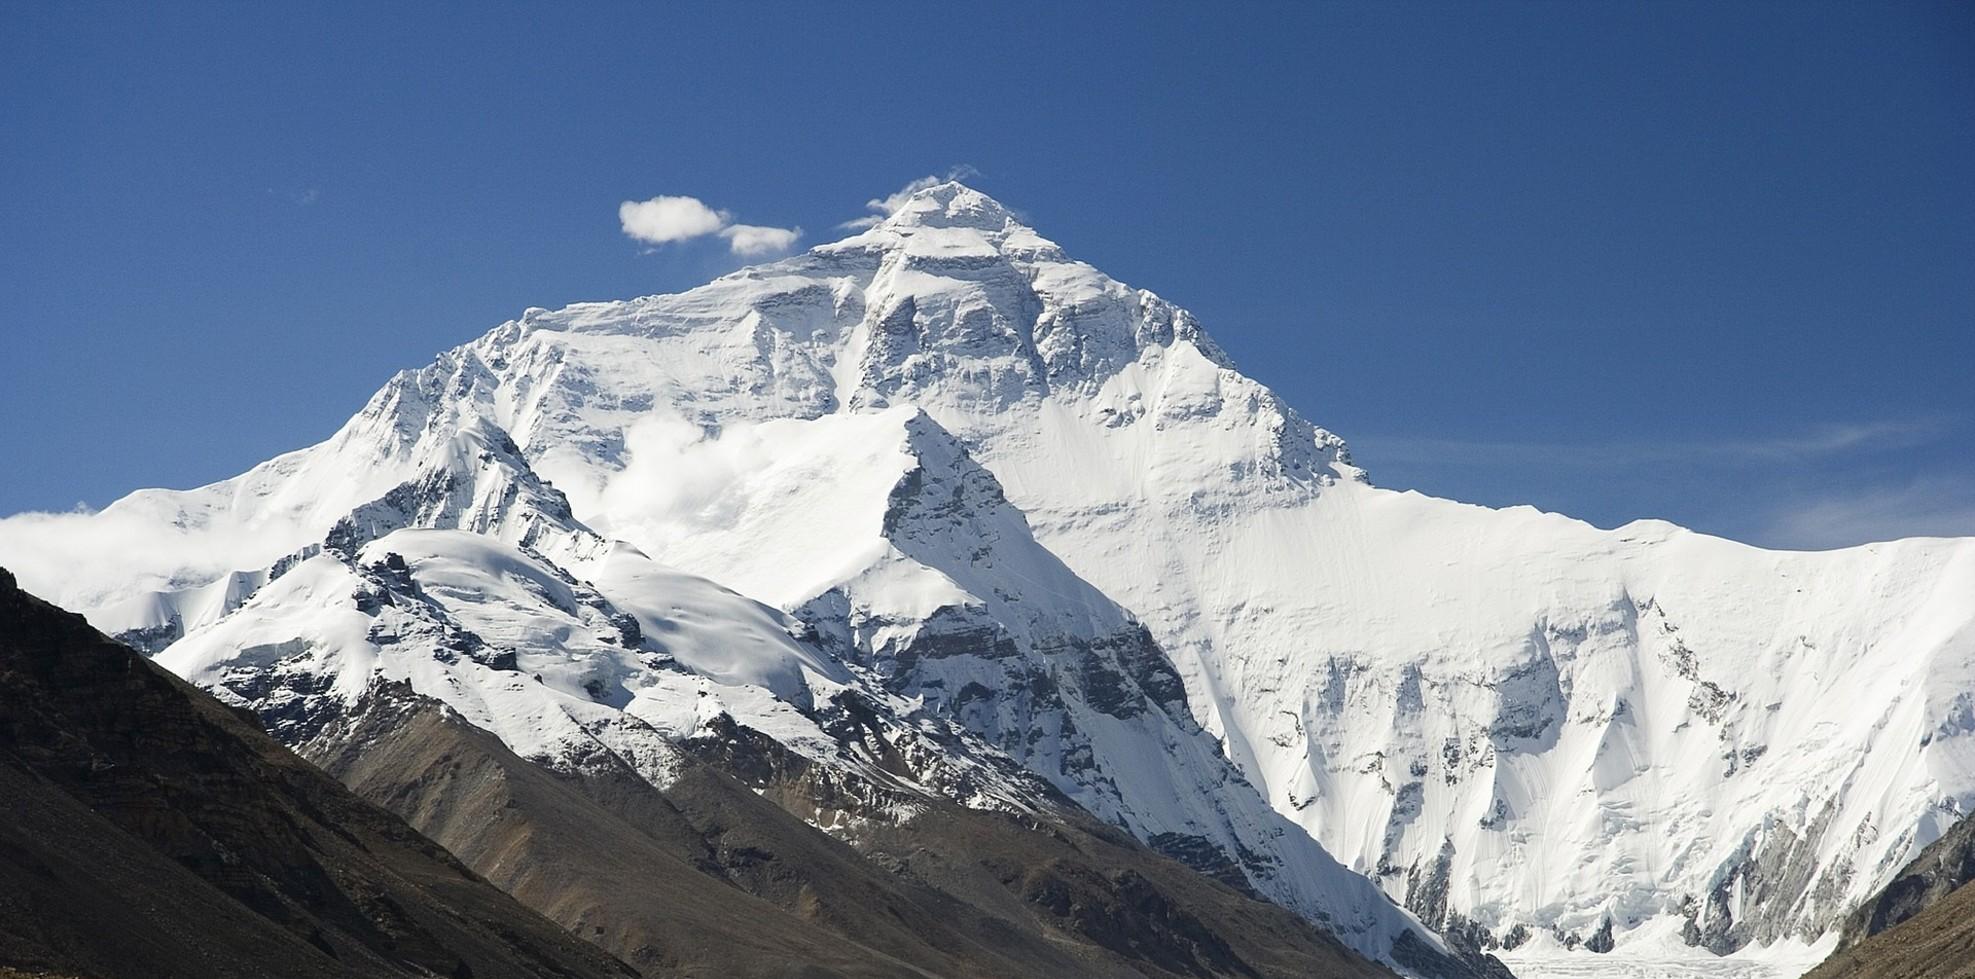 Lhasa Everest Base Camp Overland Tibet Tour